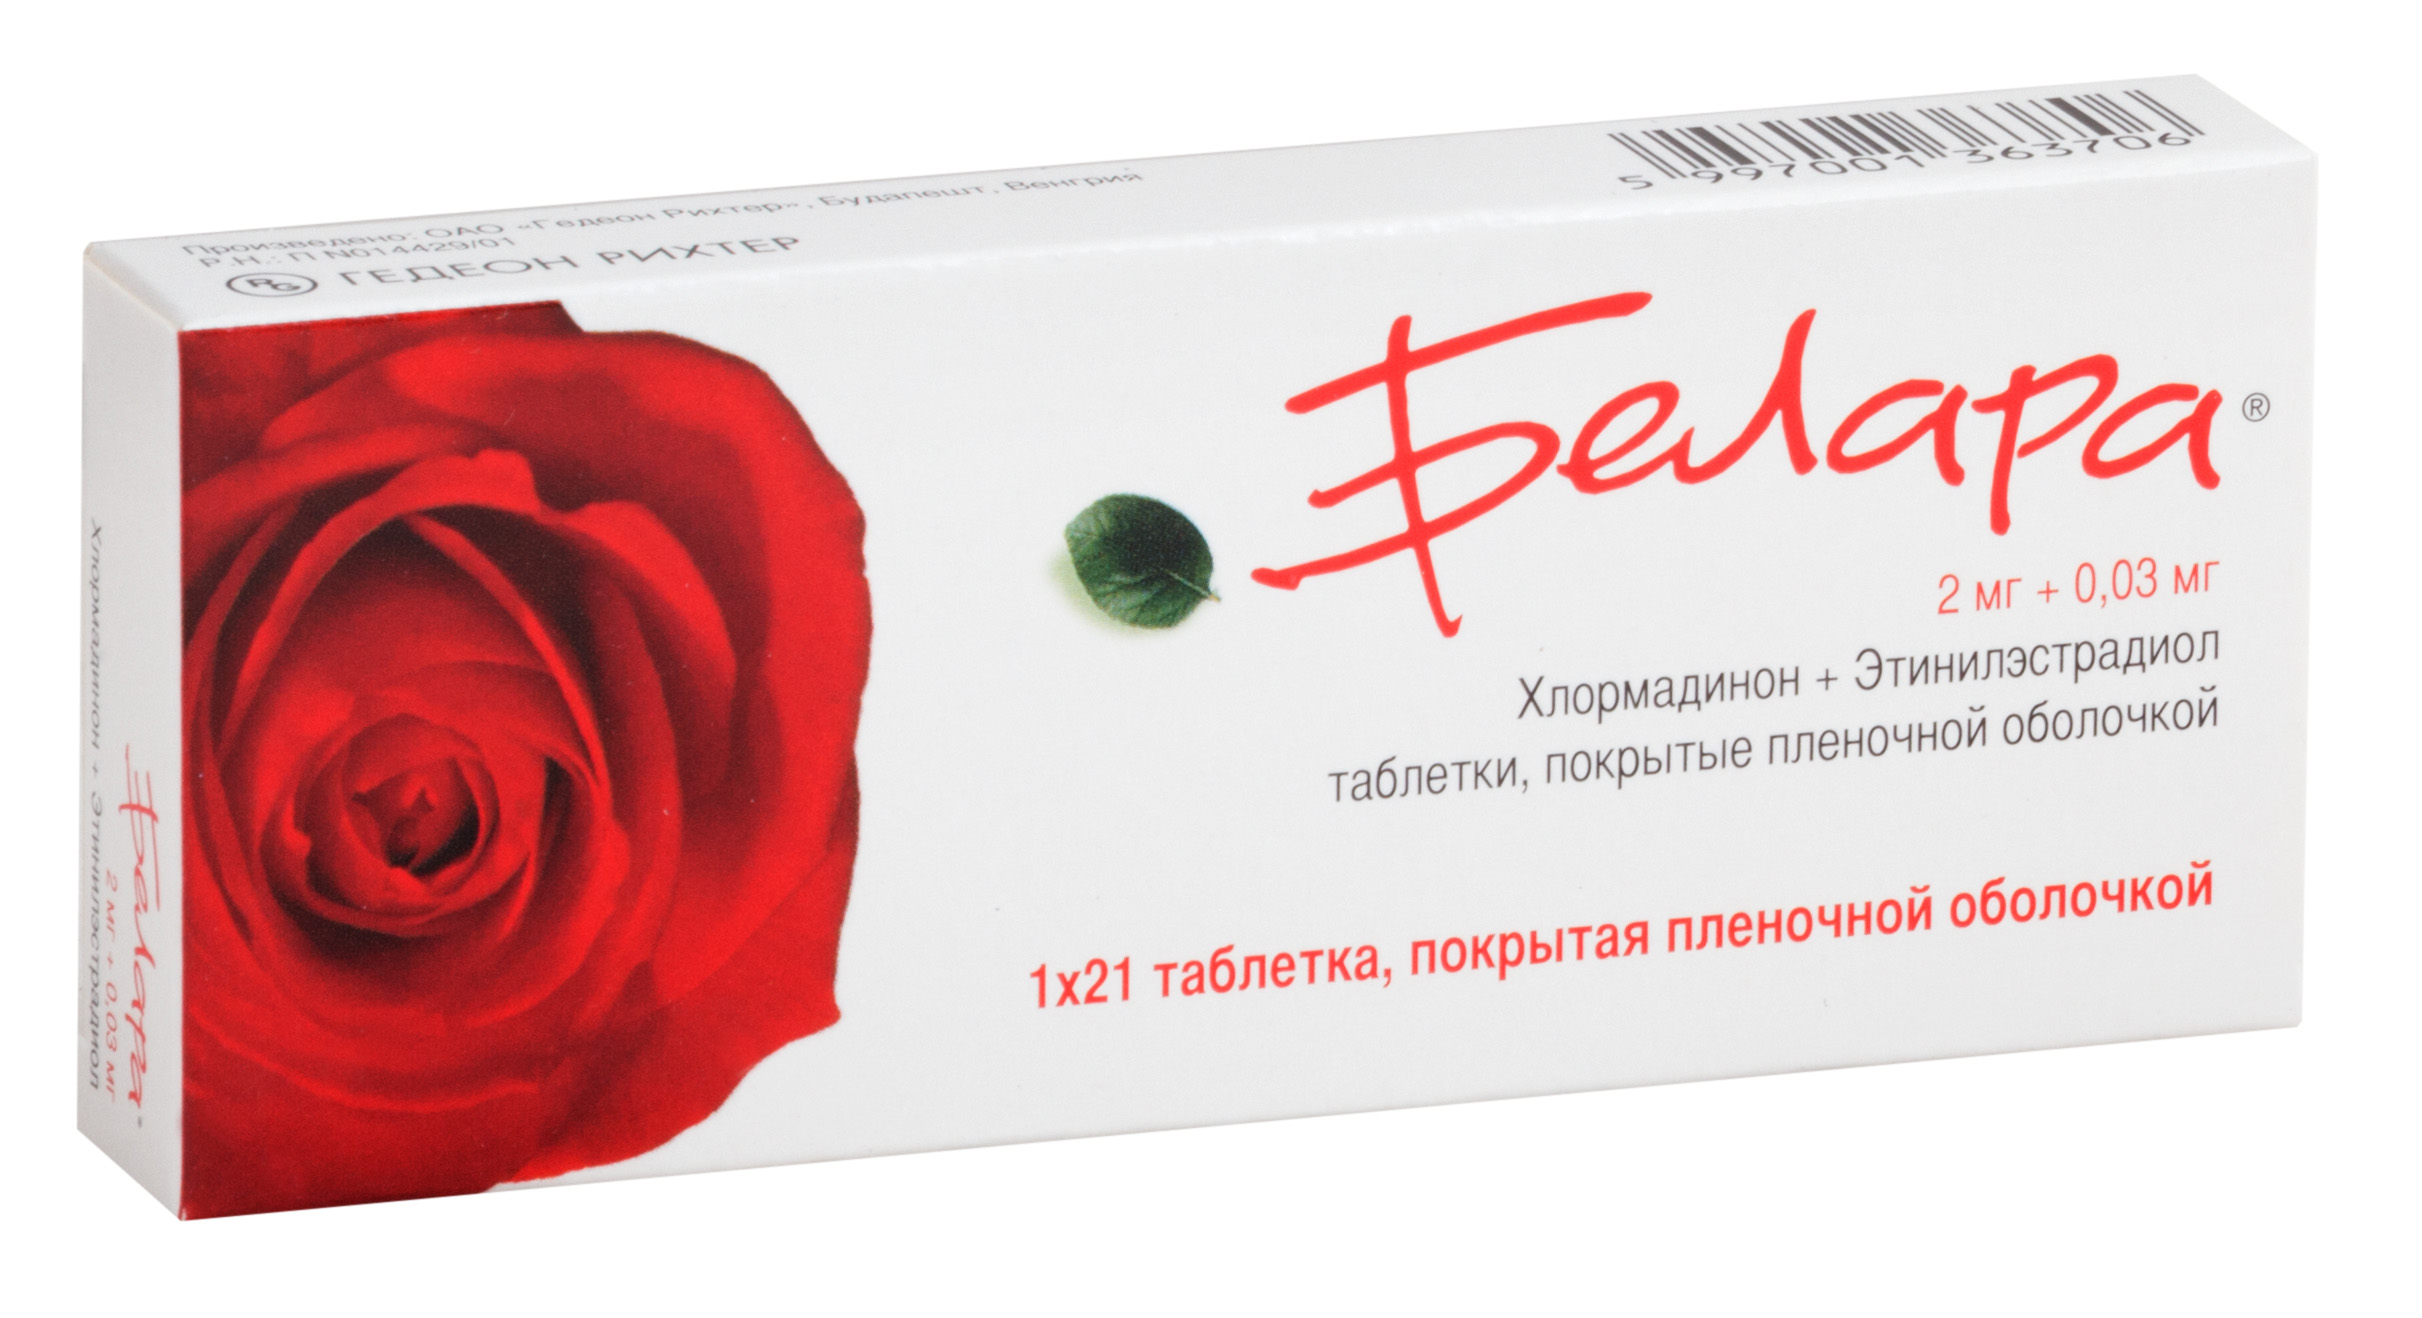 Белара табл. п.п.о. 2 мг + 0,03 мг №21